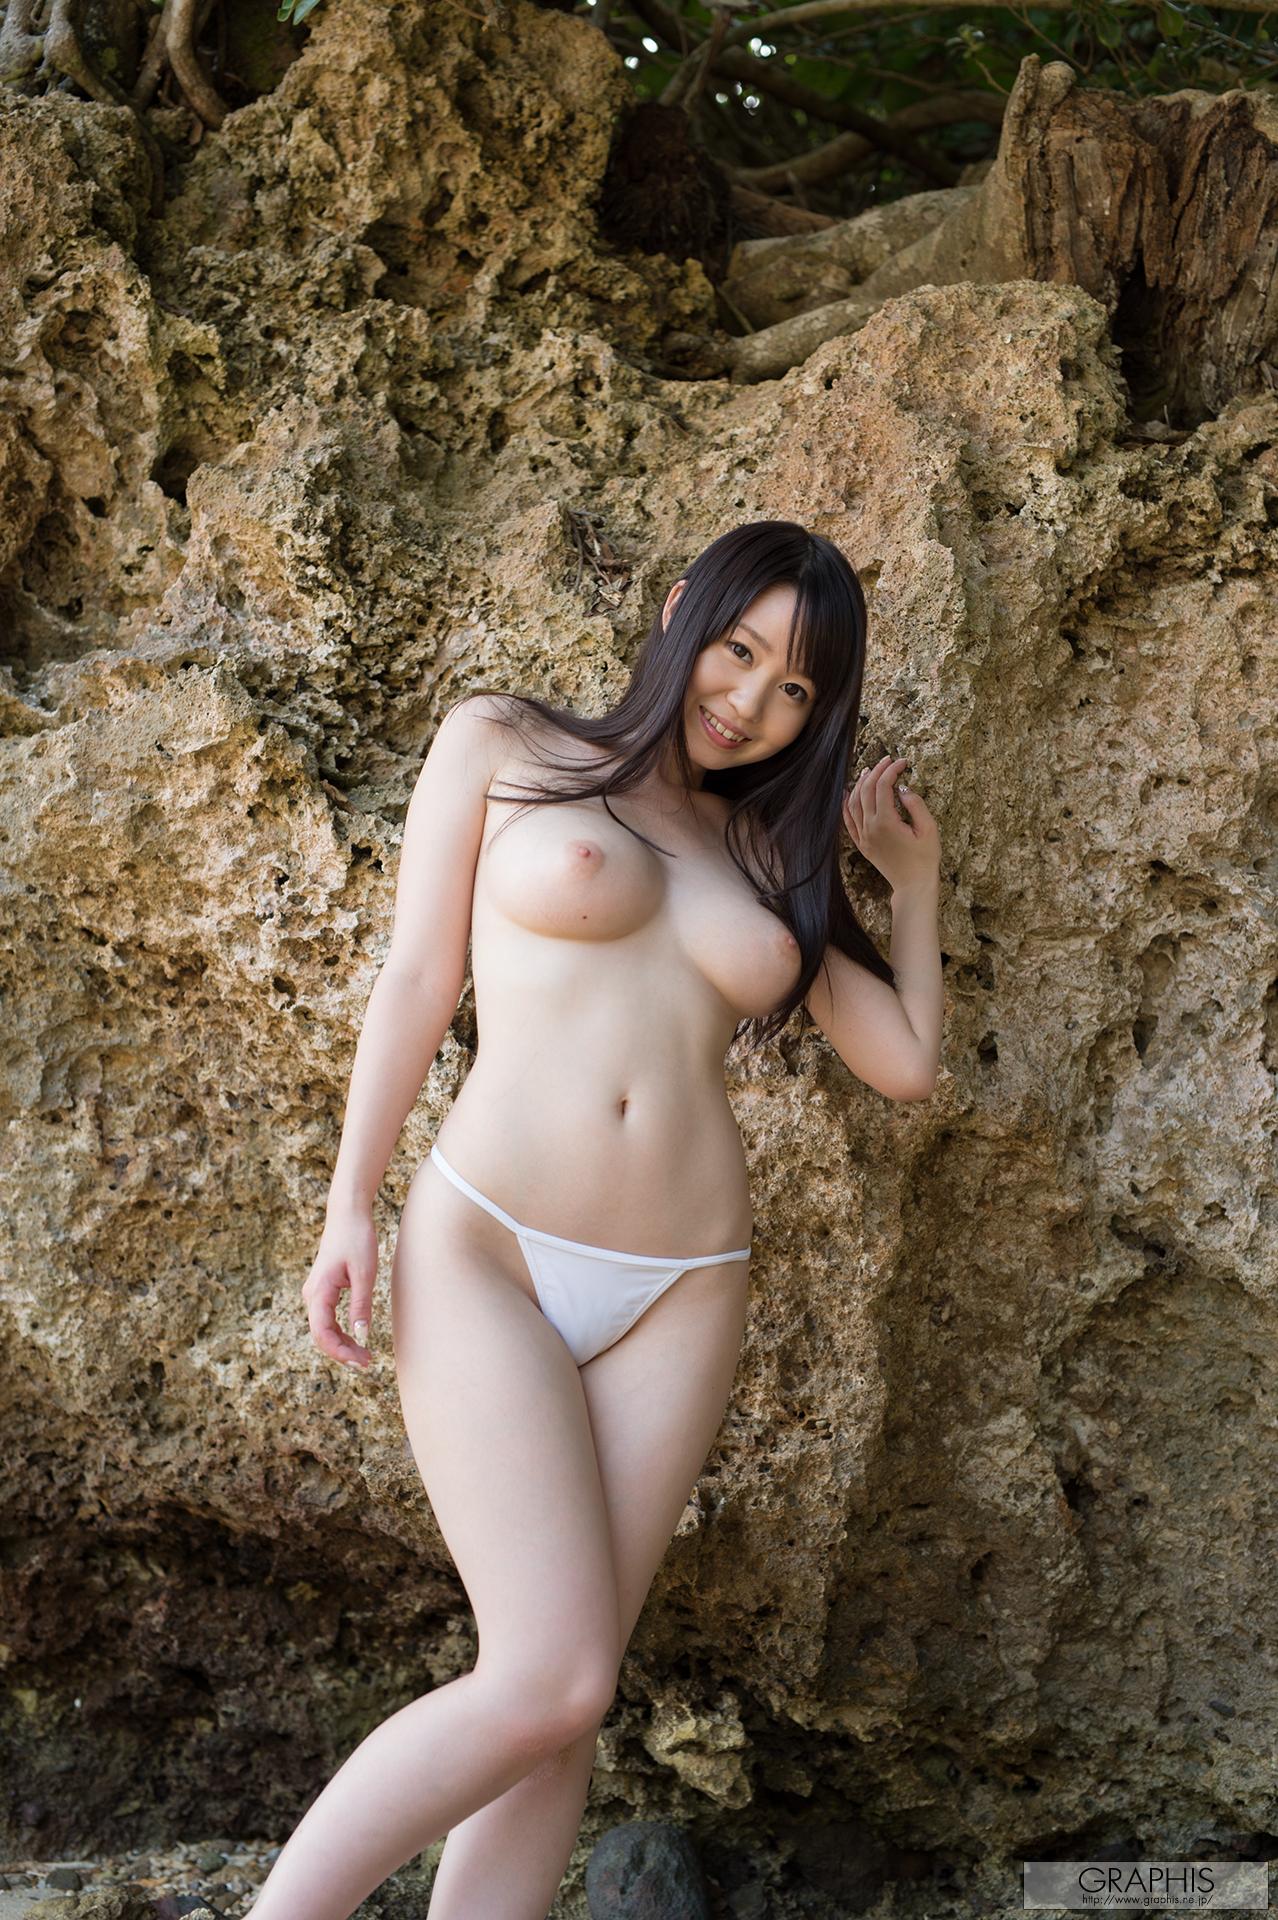 image http://scanlover.com/assets/images/272-NVQYTE81otT3t2PL.jpeg